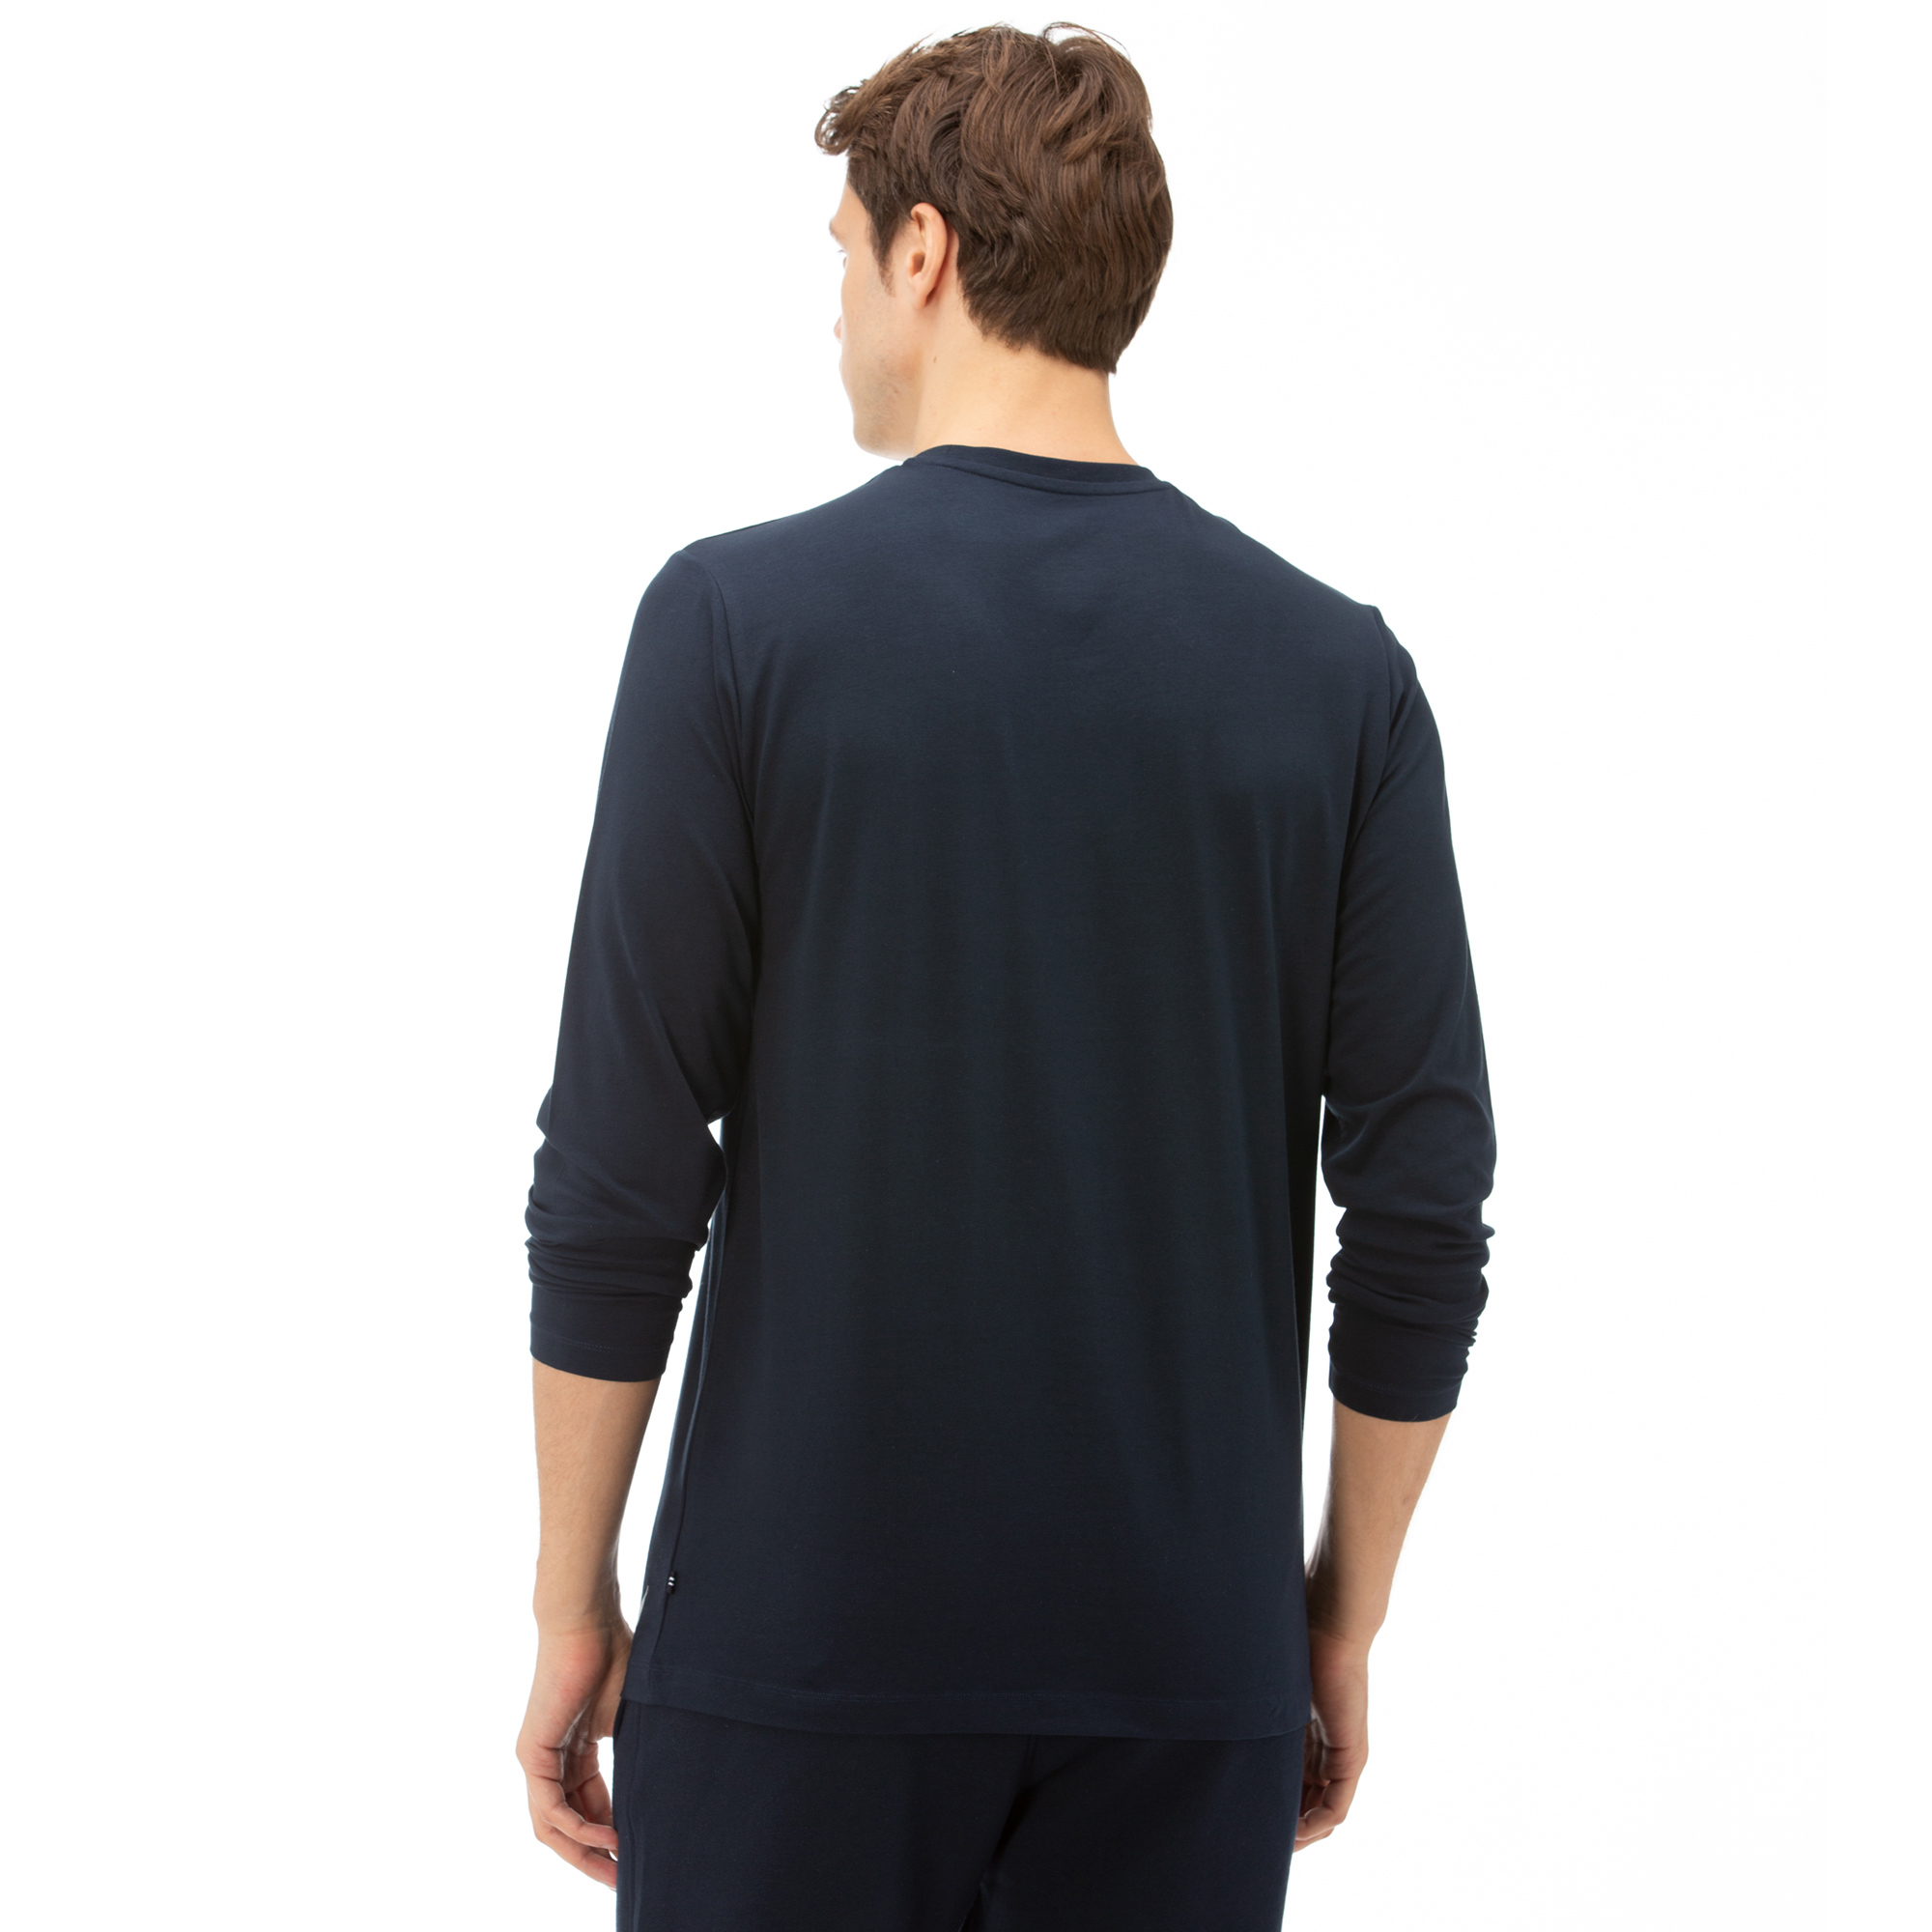 NAUTICA Erkek Lacivert Uzun Kollu Standart Fit Baskılı T-SHIRT